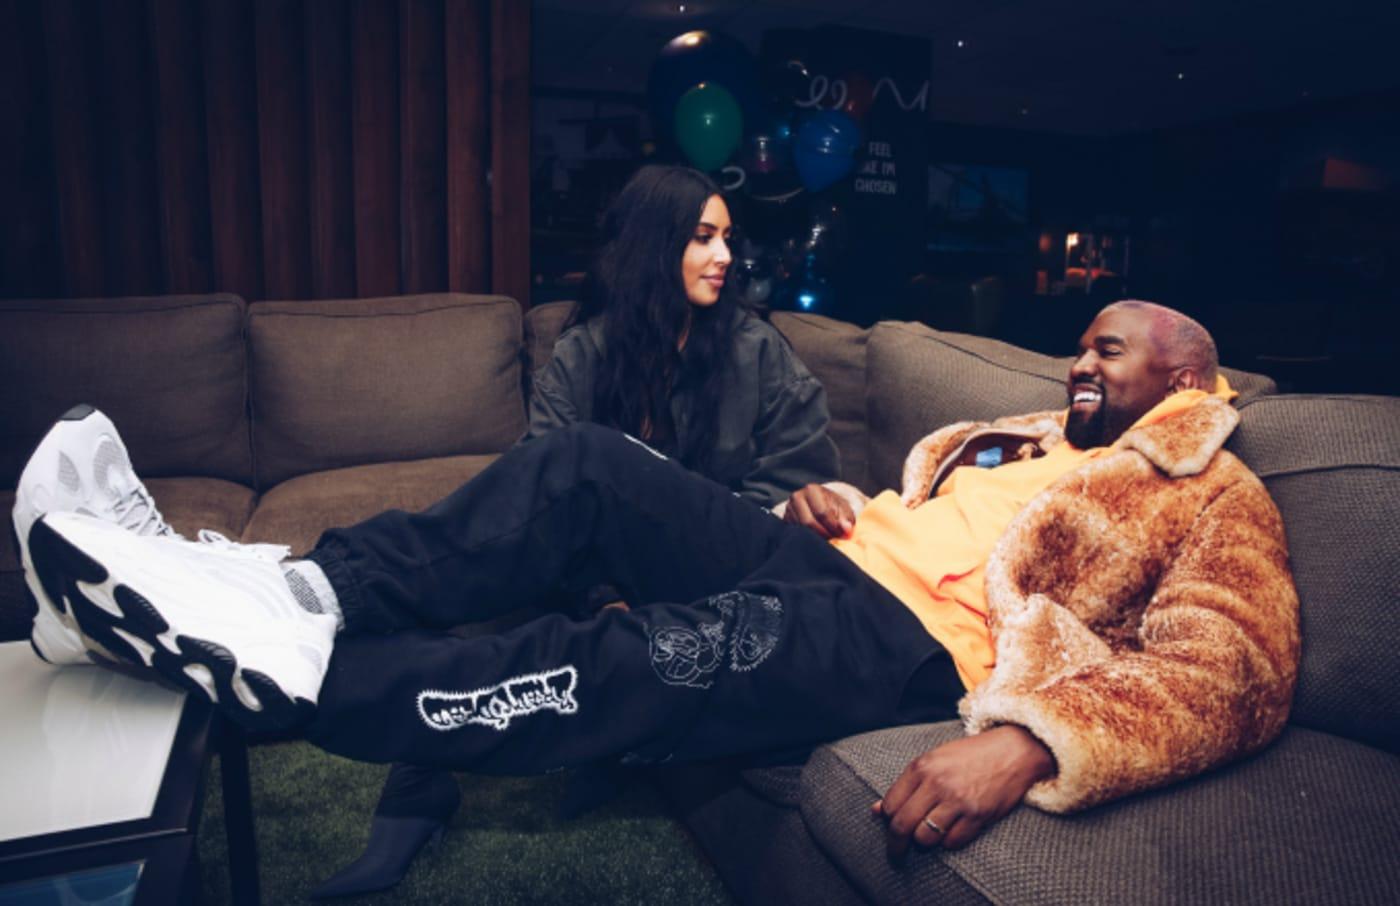 Kim Kardashian West and Kanye West attend the Travis Scott Astroworld Tour